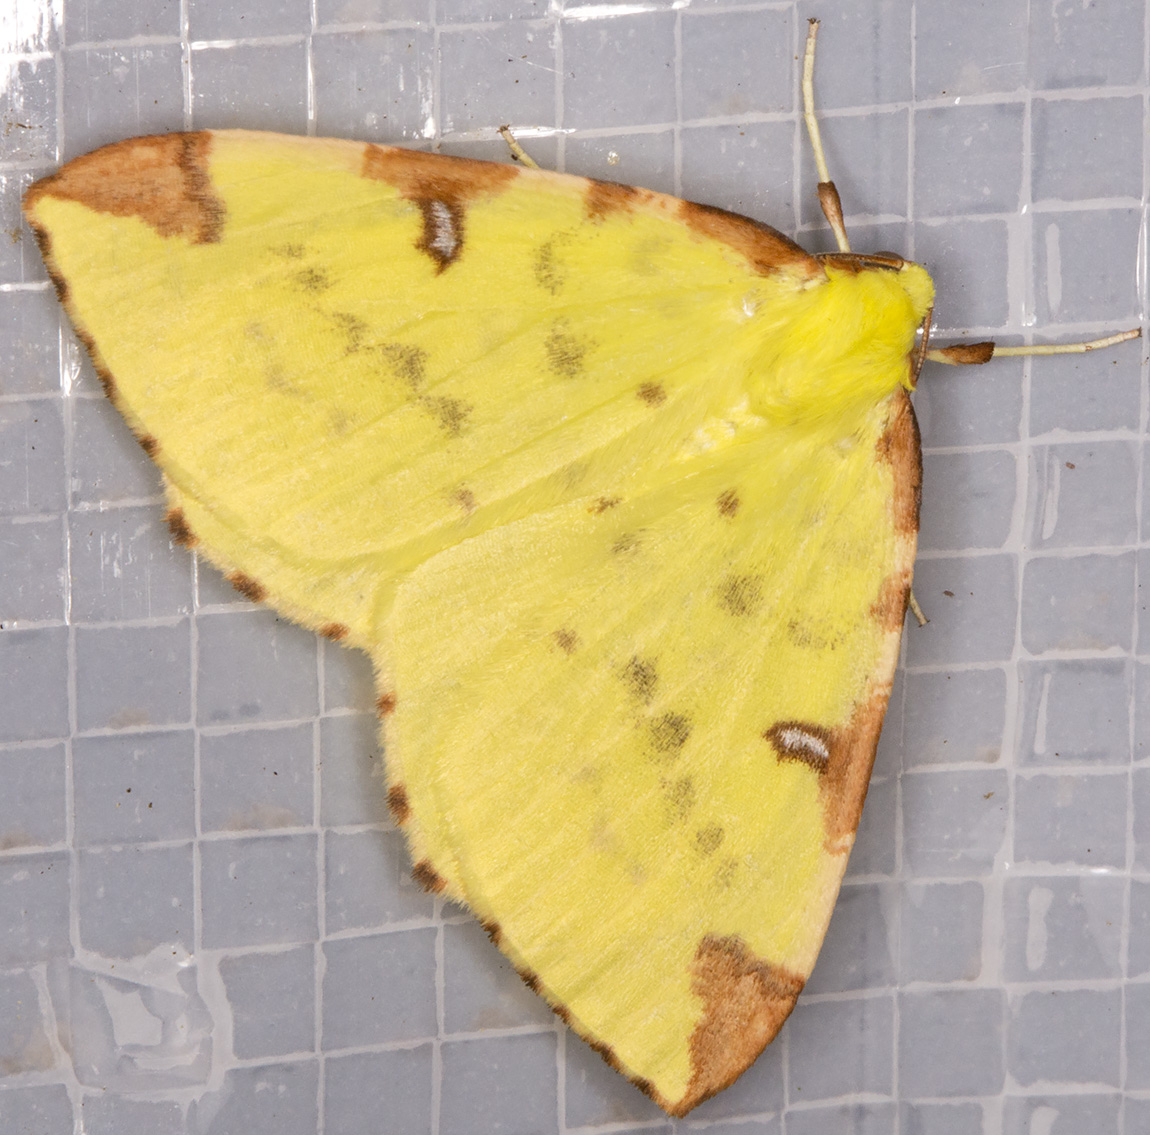 Brimstone Moth, Opisthograptis luteolata.  Geometridae.  Moth trap at Sevenoaks Wildlife Reserve, 27 April 2014.